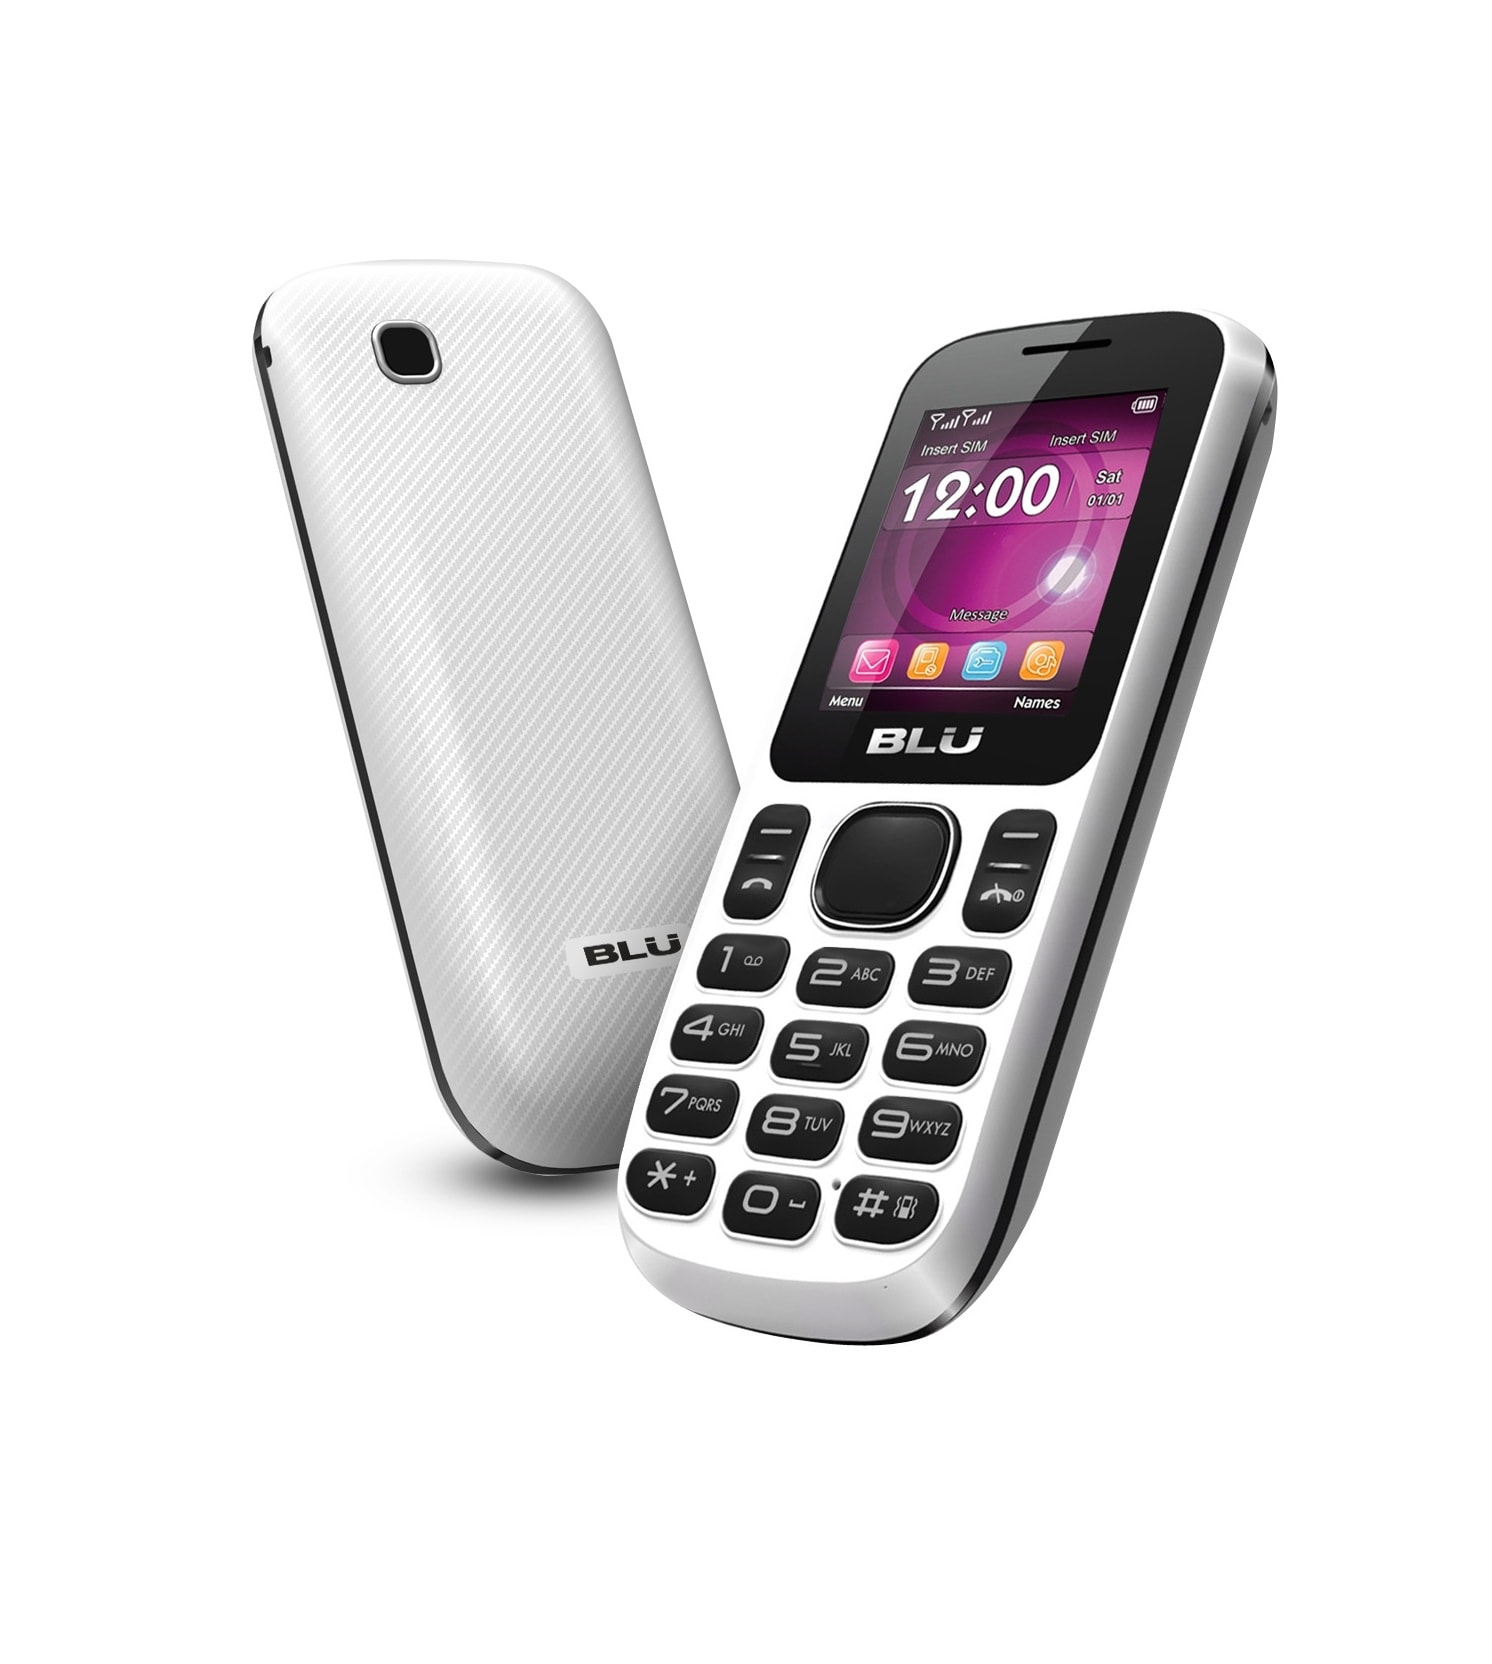 BLU Jenny T172i GSM Unlocked Dual SIM Cell Phone - White